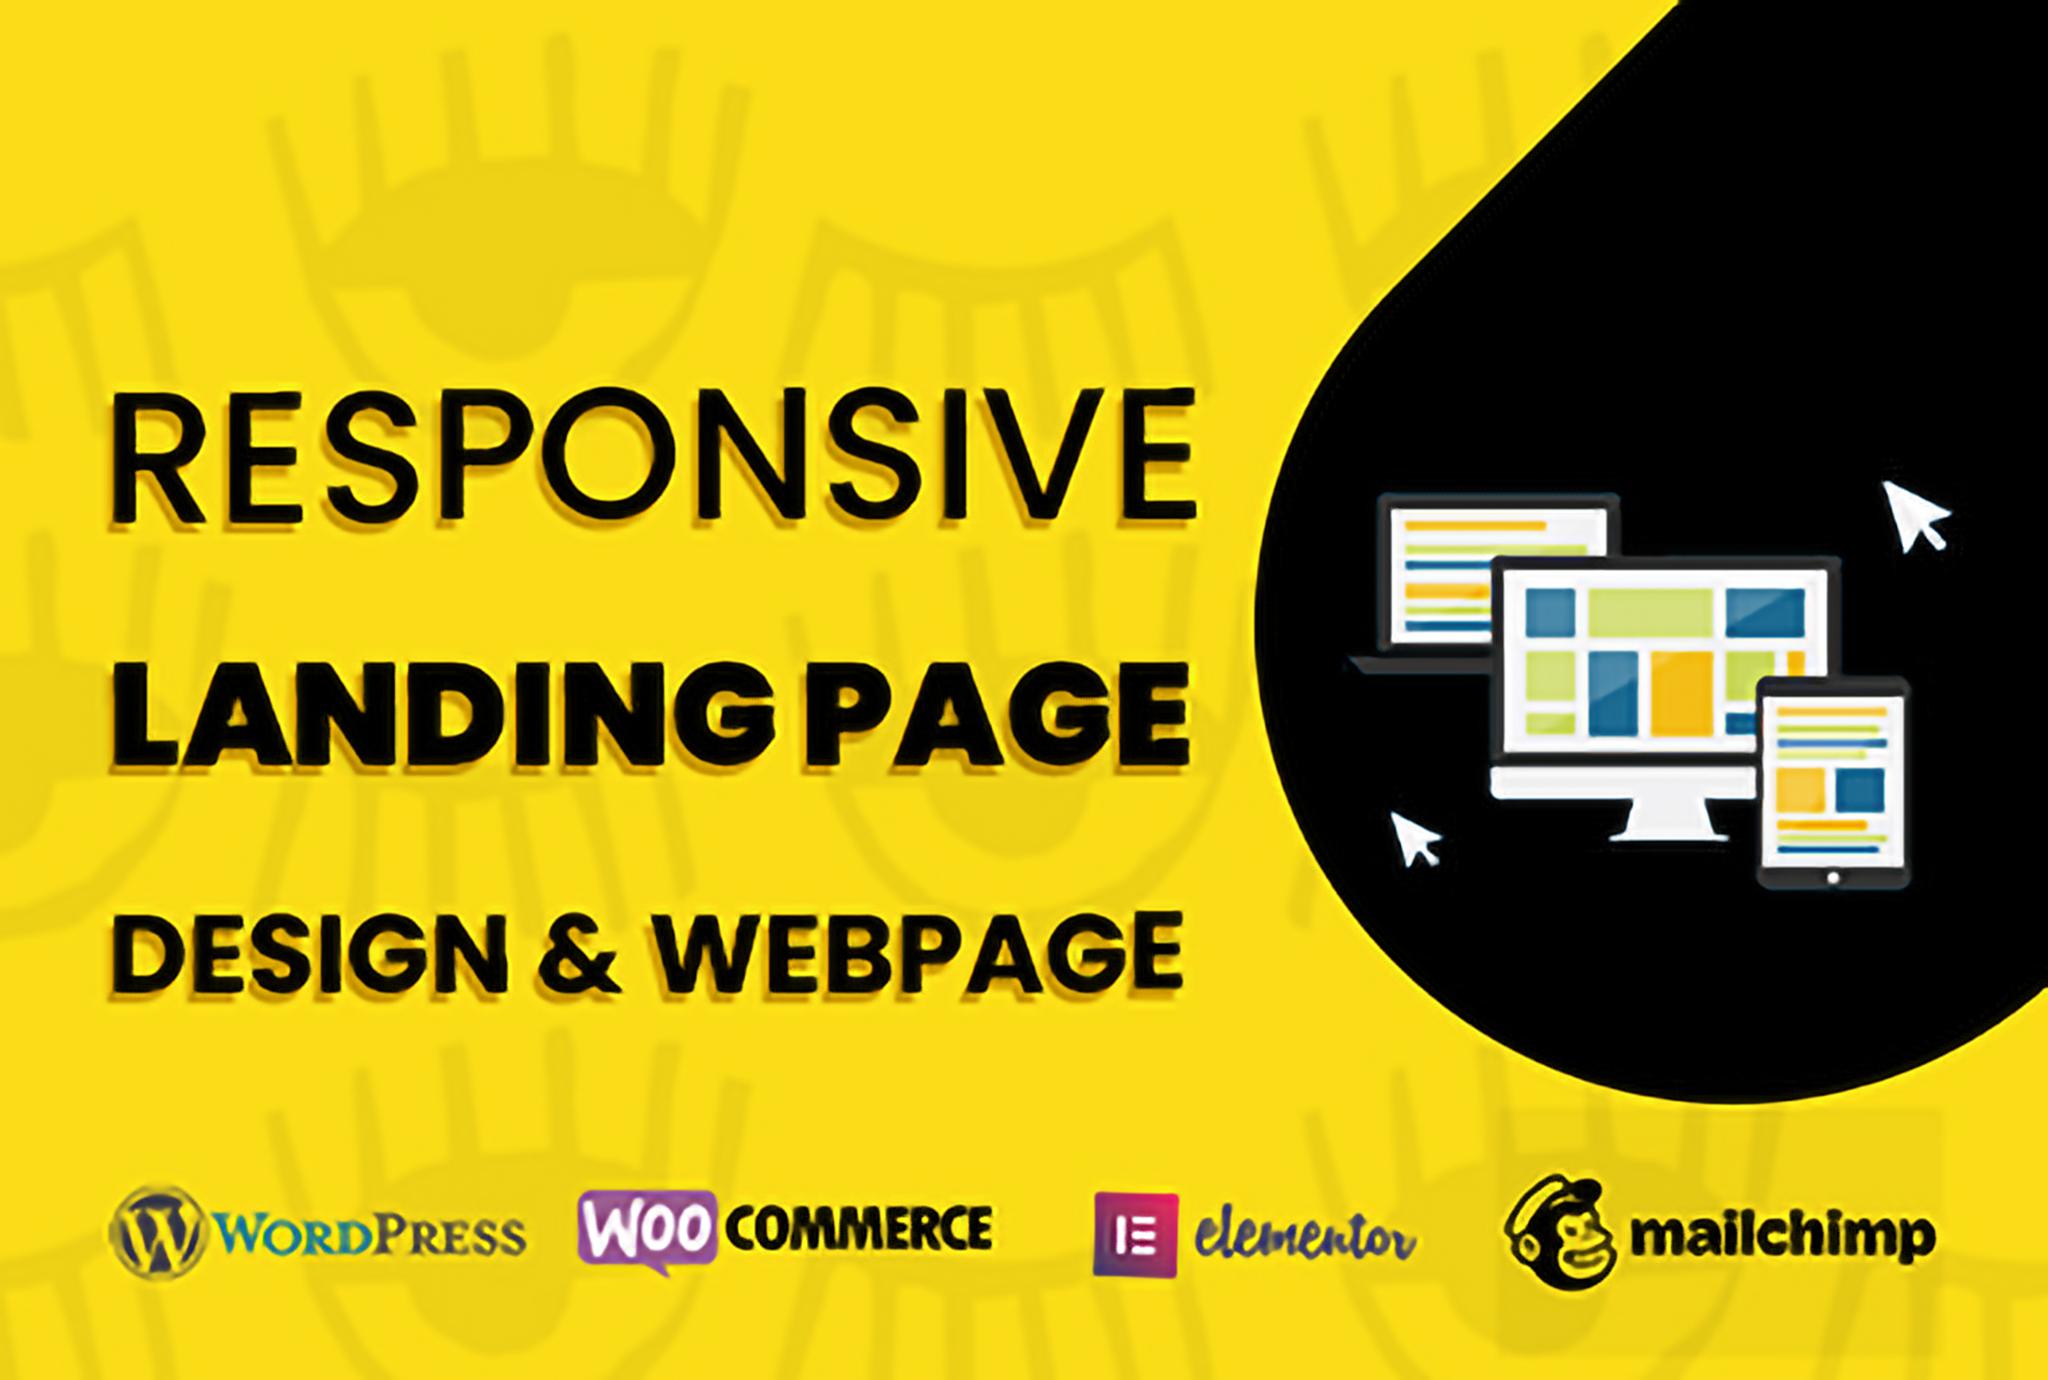 Design a modern webpage and wordpress landing page